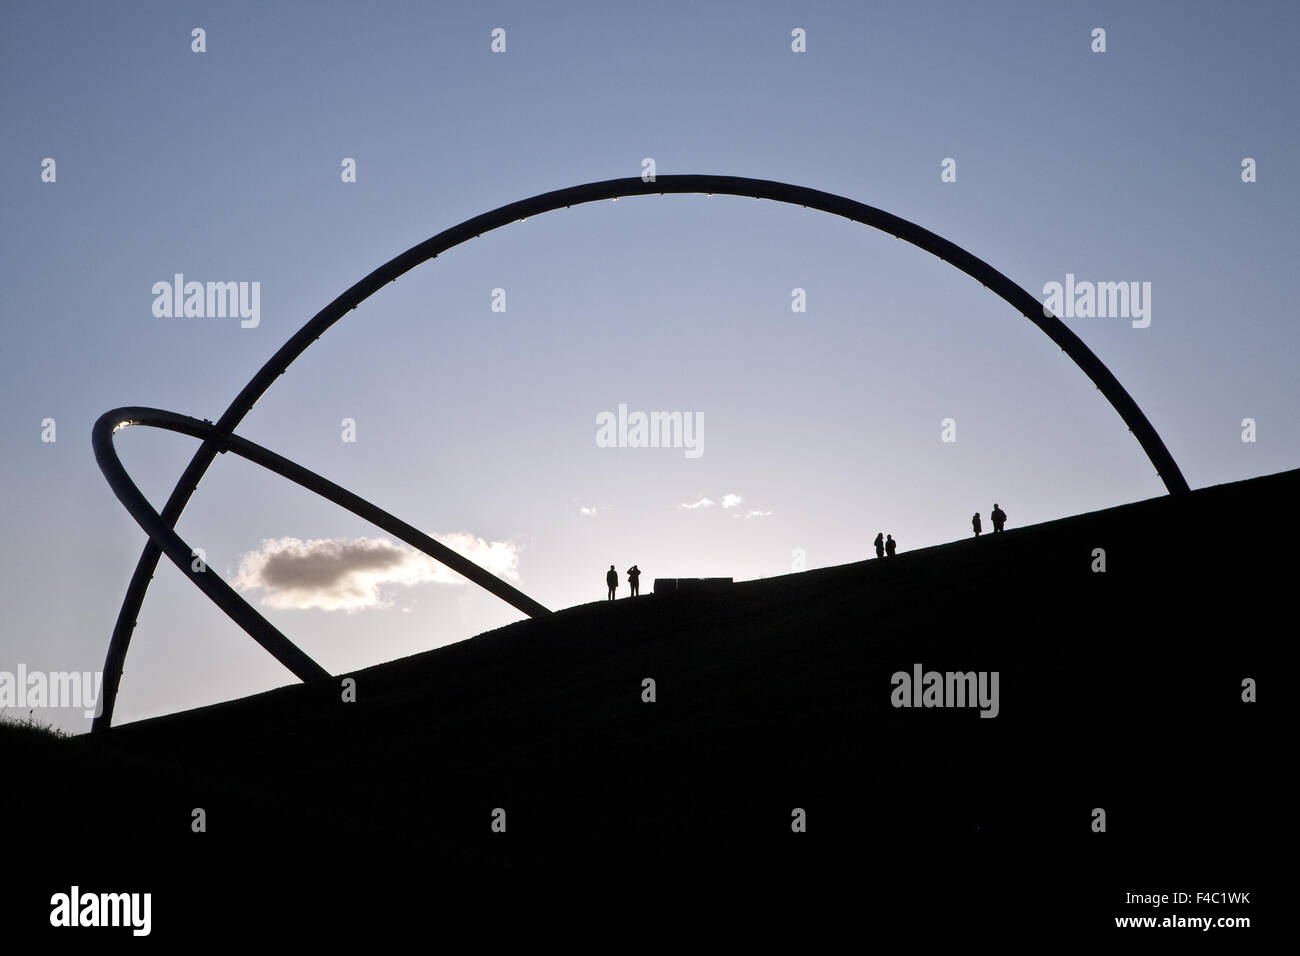 Horizont-Observatorium, Halde, Herten, Deutschland Stockbild